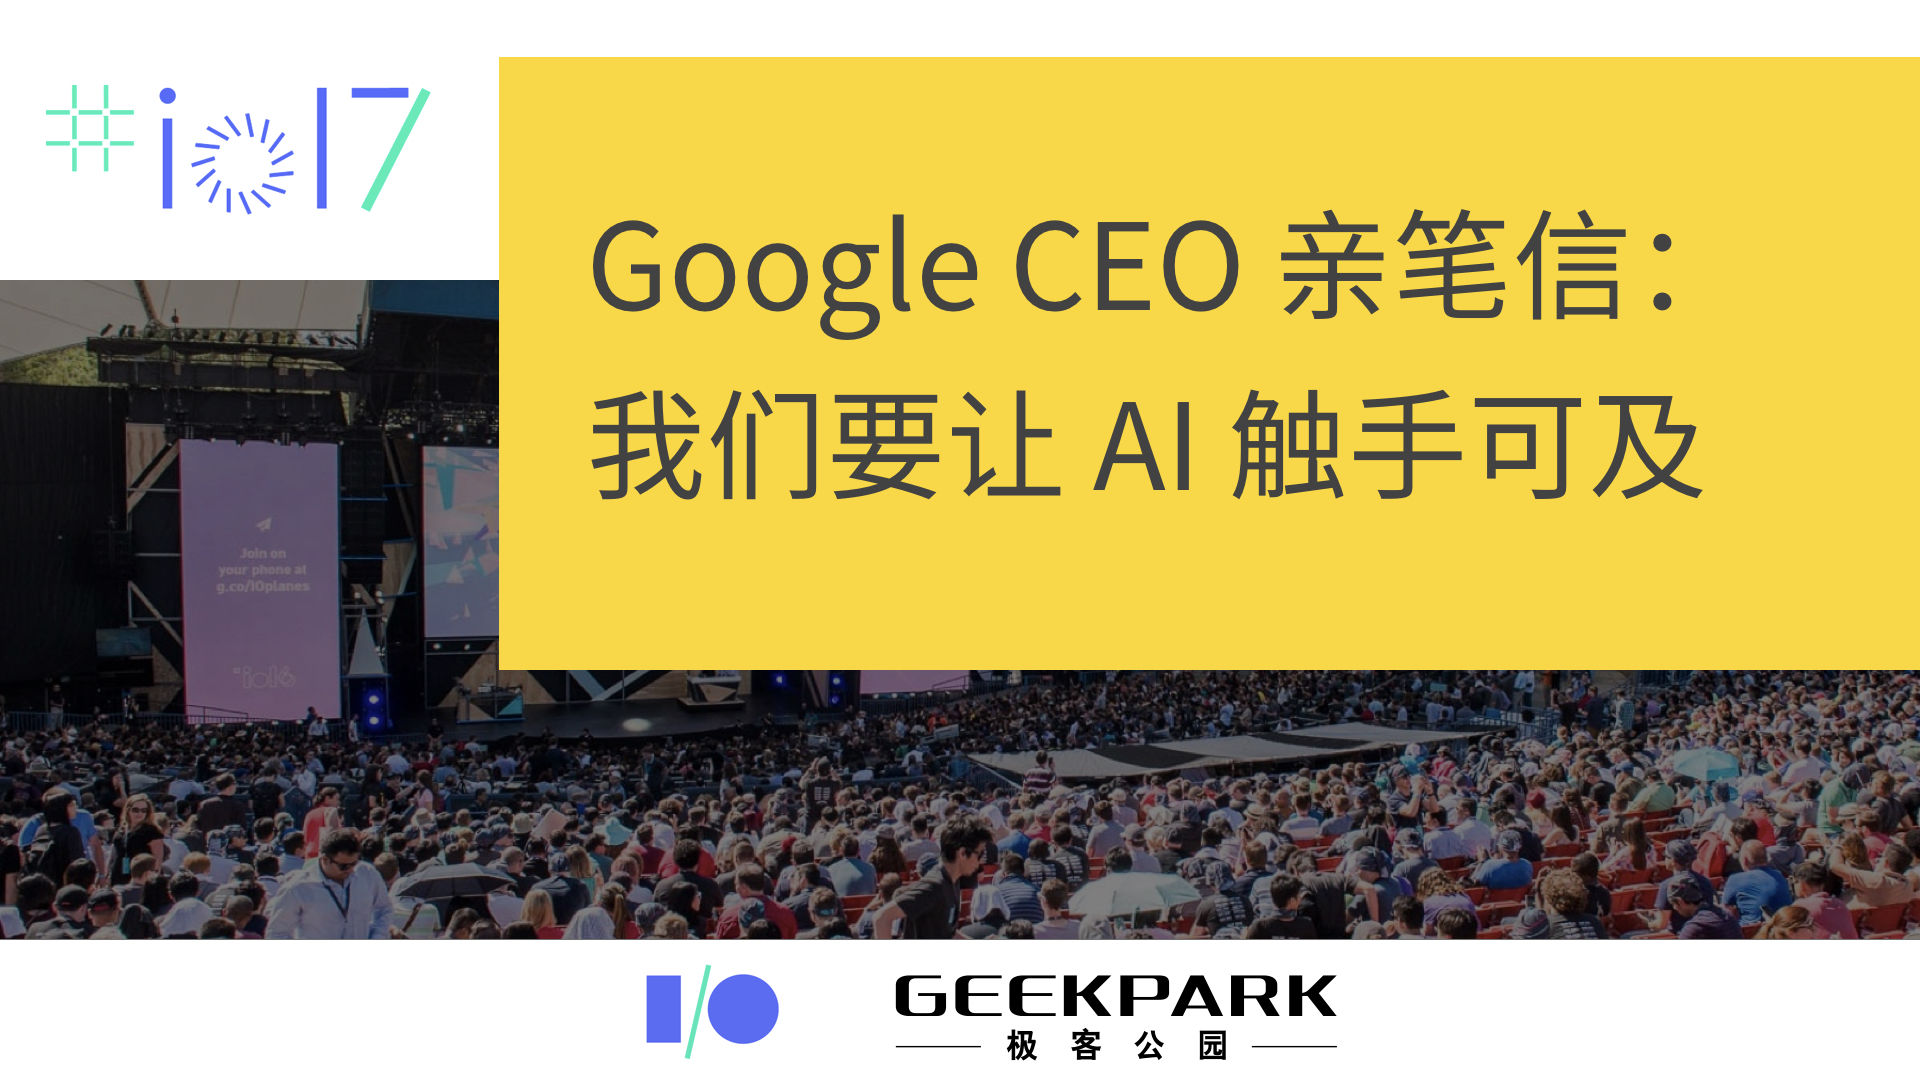 Google CEO 亲笔信:我们要让 AI 触手可及